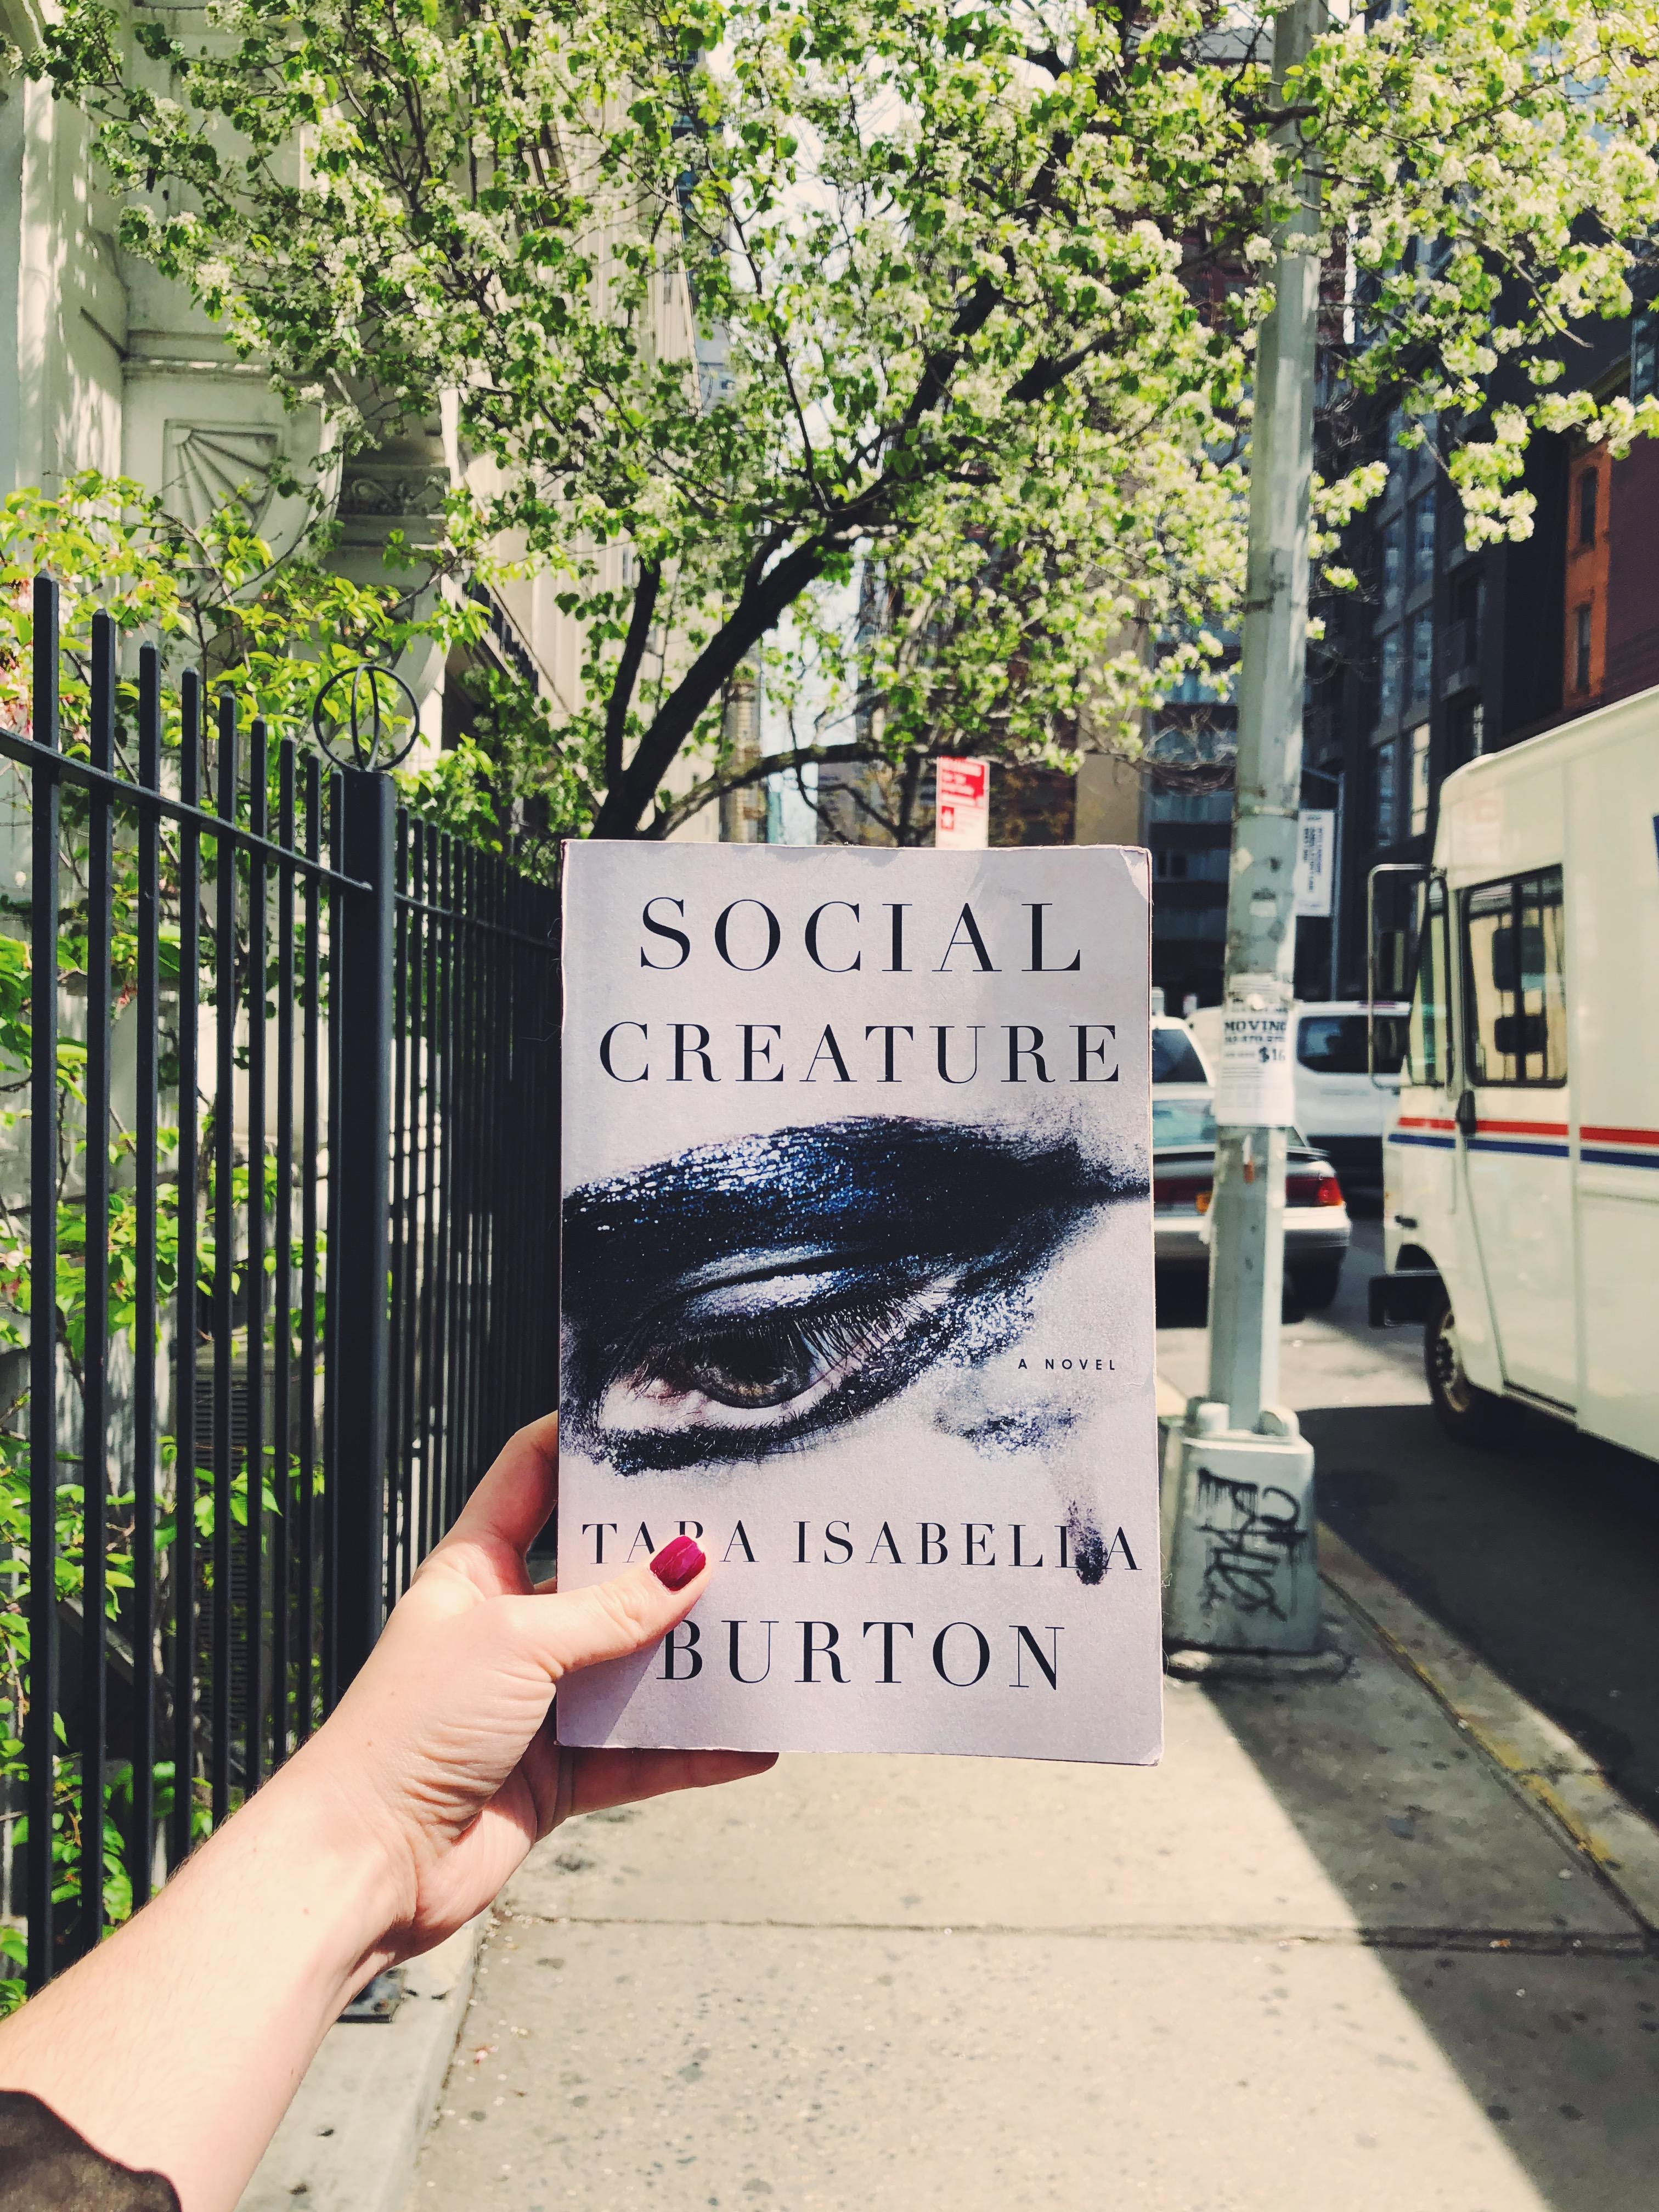 Social Creature by Tara Isabella Burton